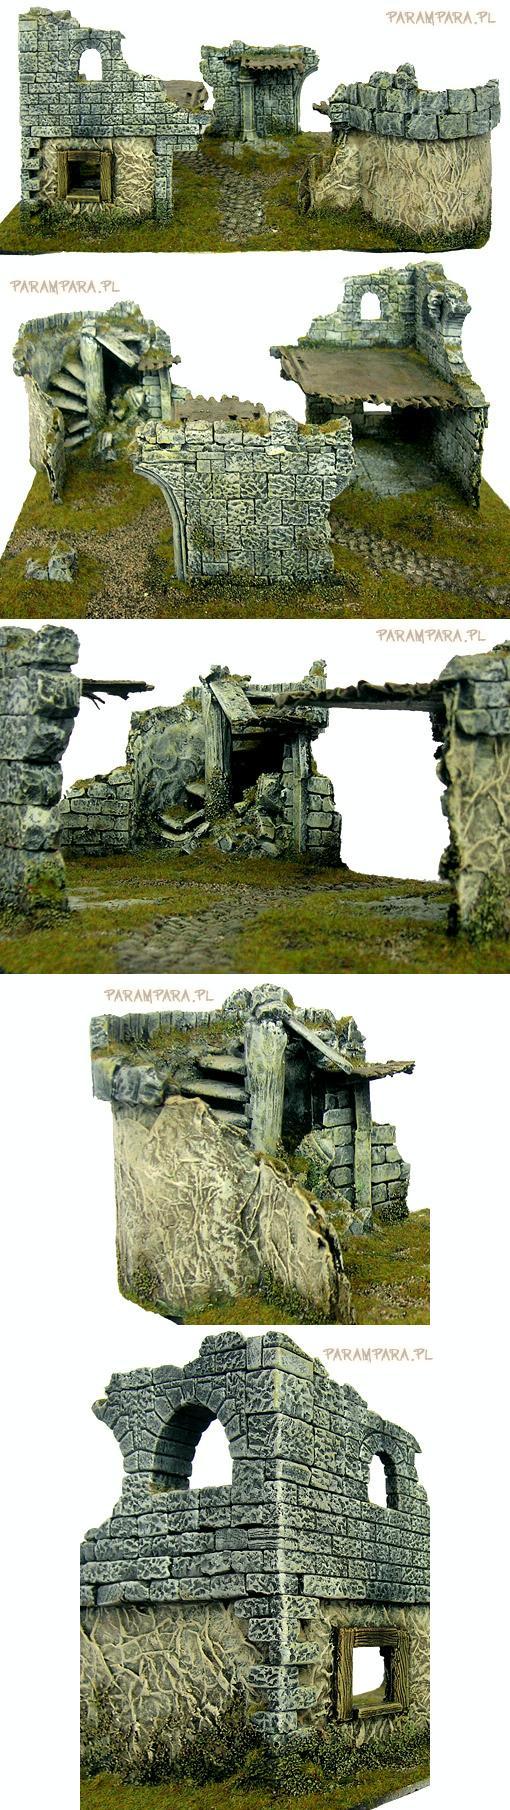 Buildings, Damaged, House, Mordheim, Ruined, Ruins, Stairs, Terrain, Walls, Warhammer Fantasy